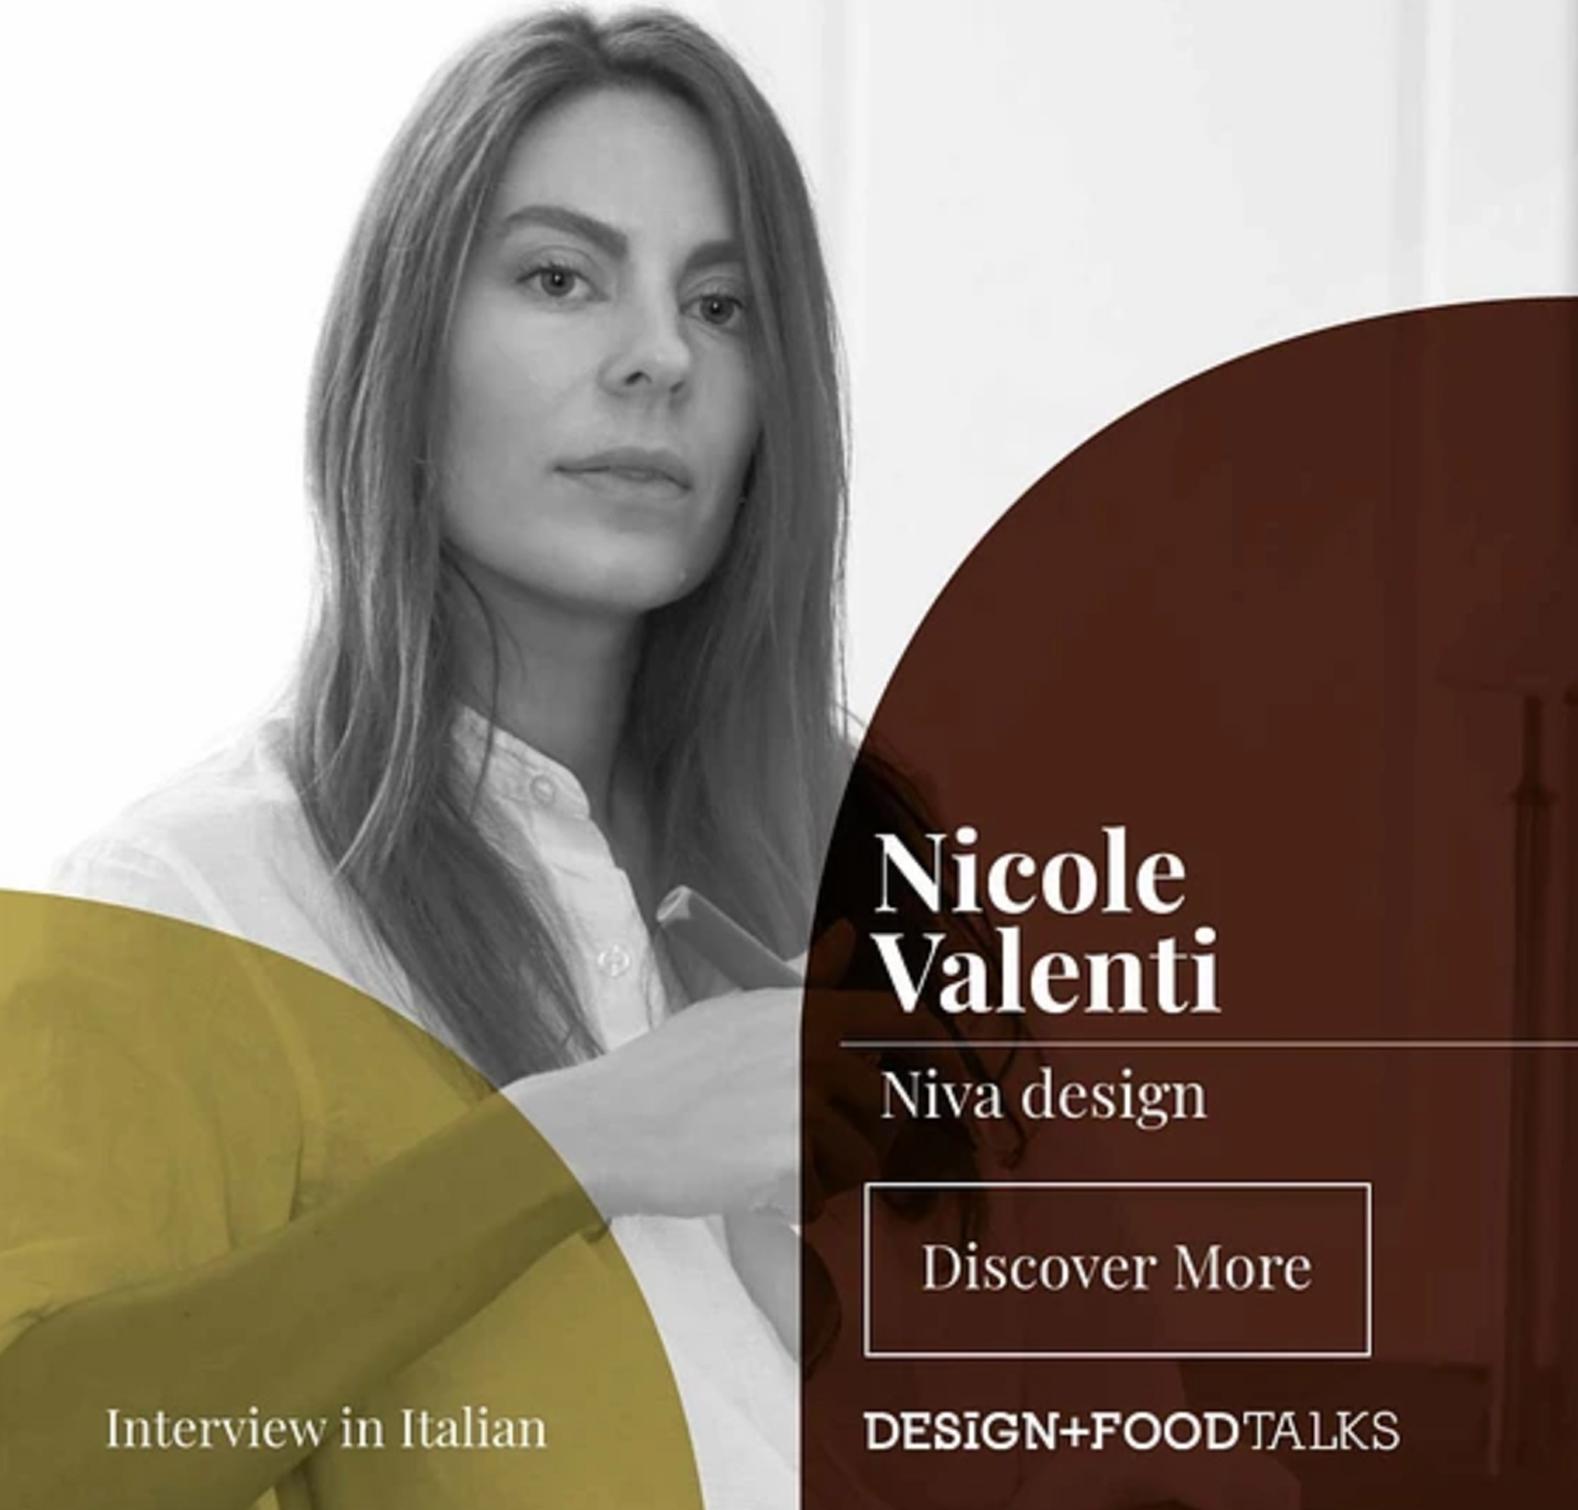 DESIGN + FOODTALKS with Nicole Valenti